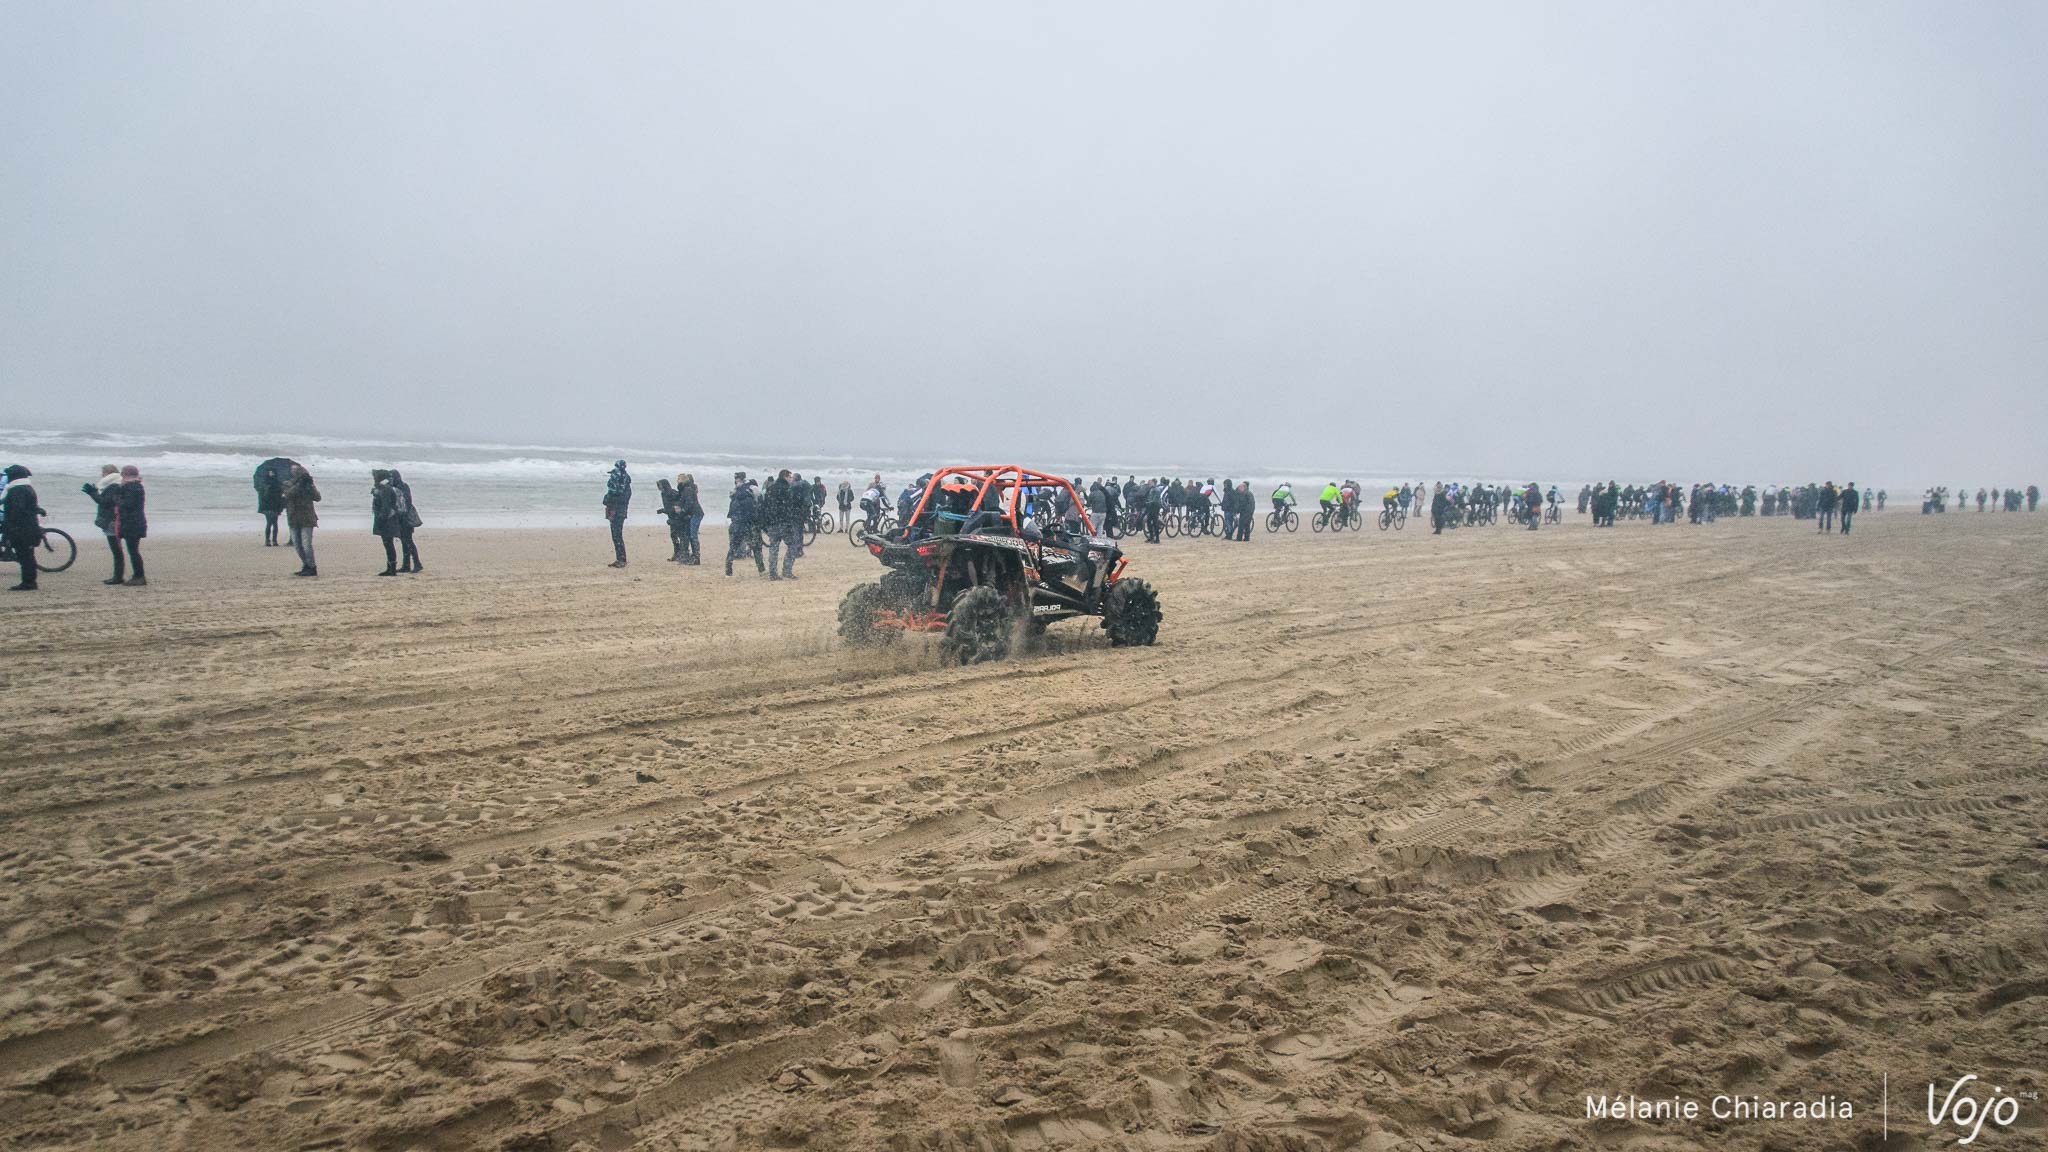 beachrace_egmond_pier_egmond_mel_copyright_obeart_vojomag-20-2